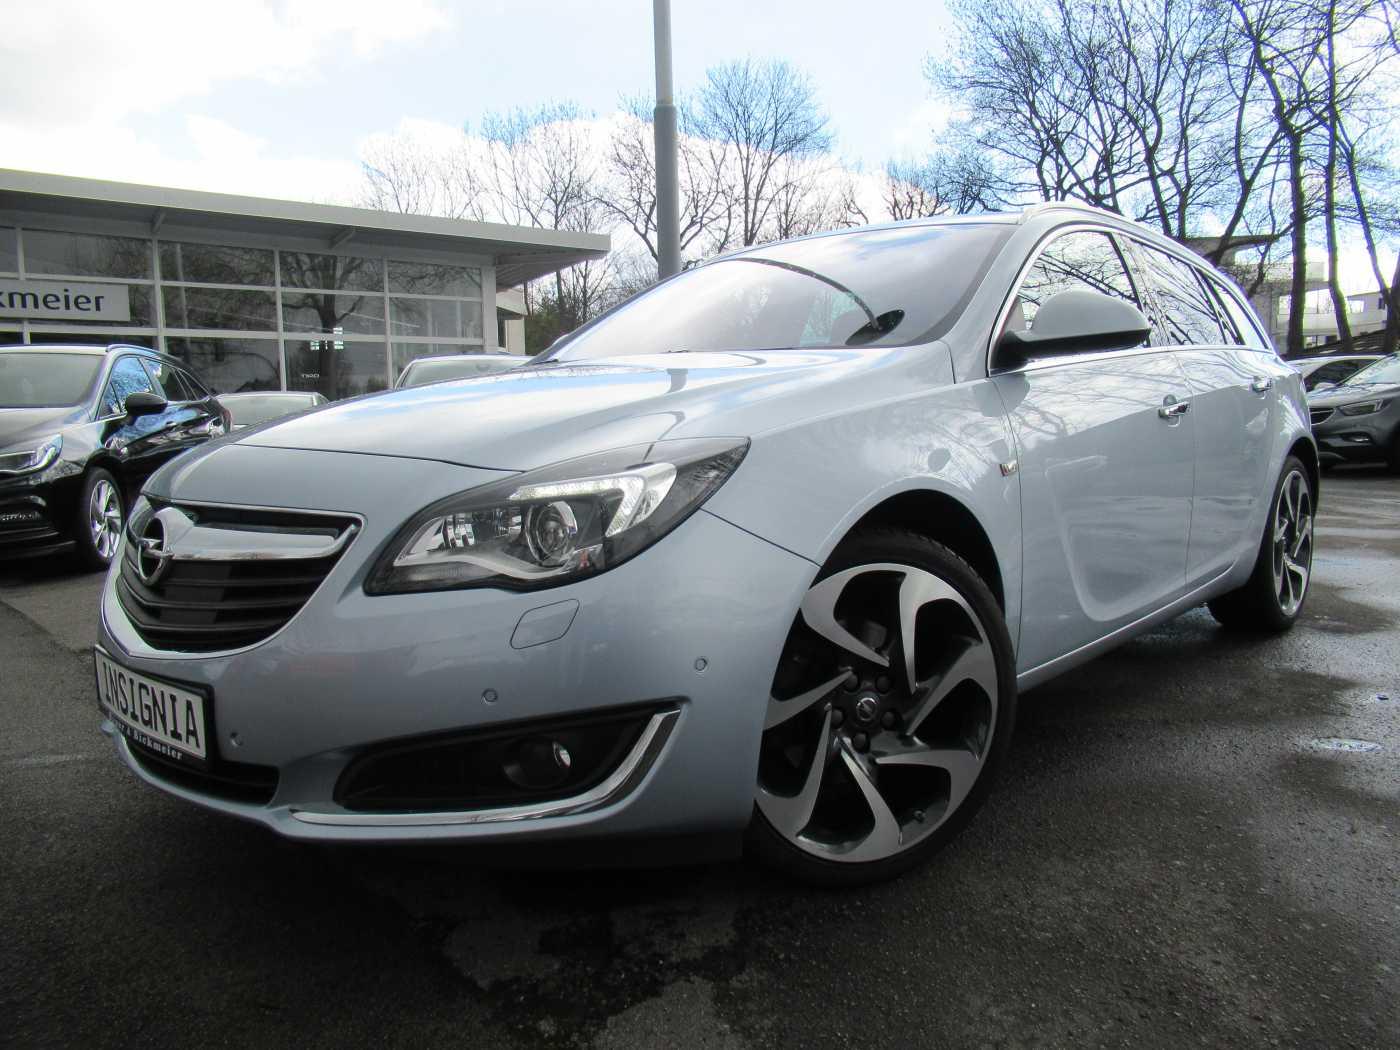 Opel Insignia Sports Tourer 2.0 D Innovation 4x4 AUTOMATIK, Jahr 2014, Diesel